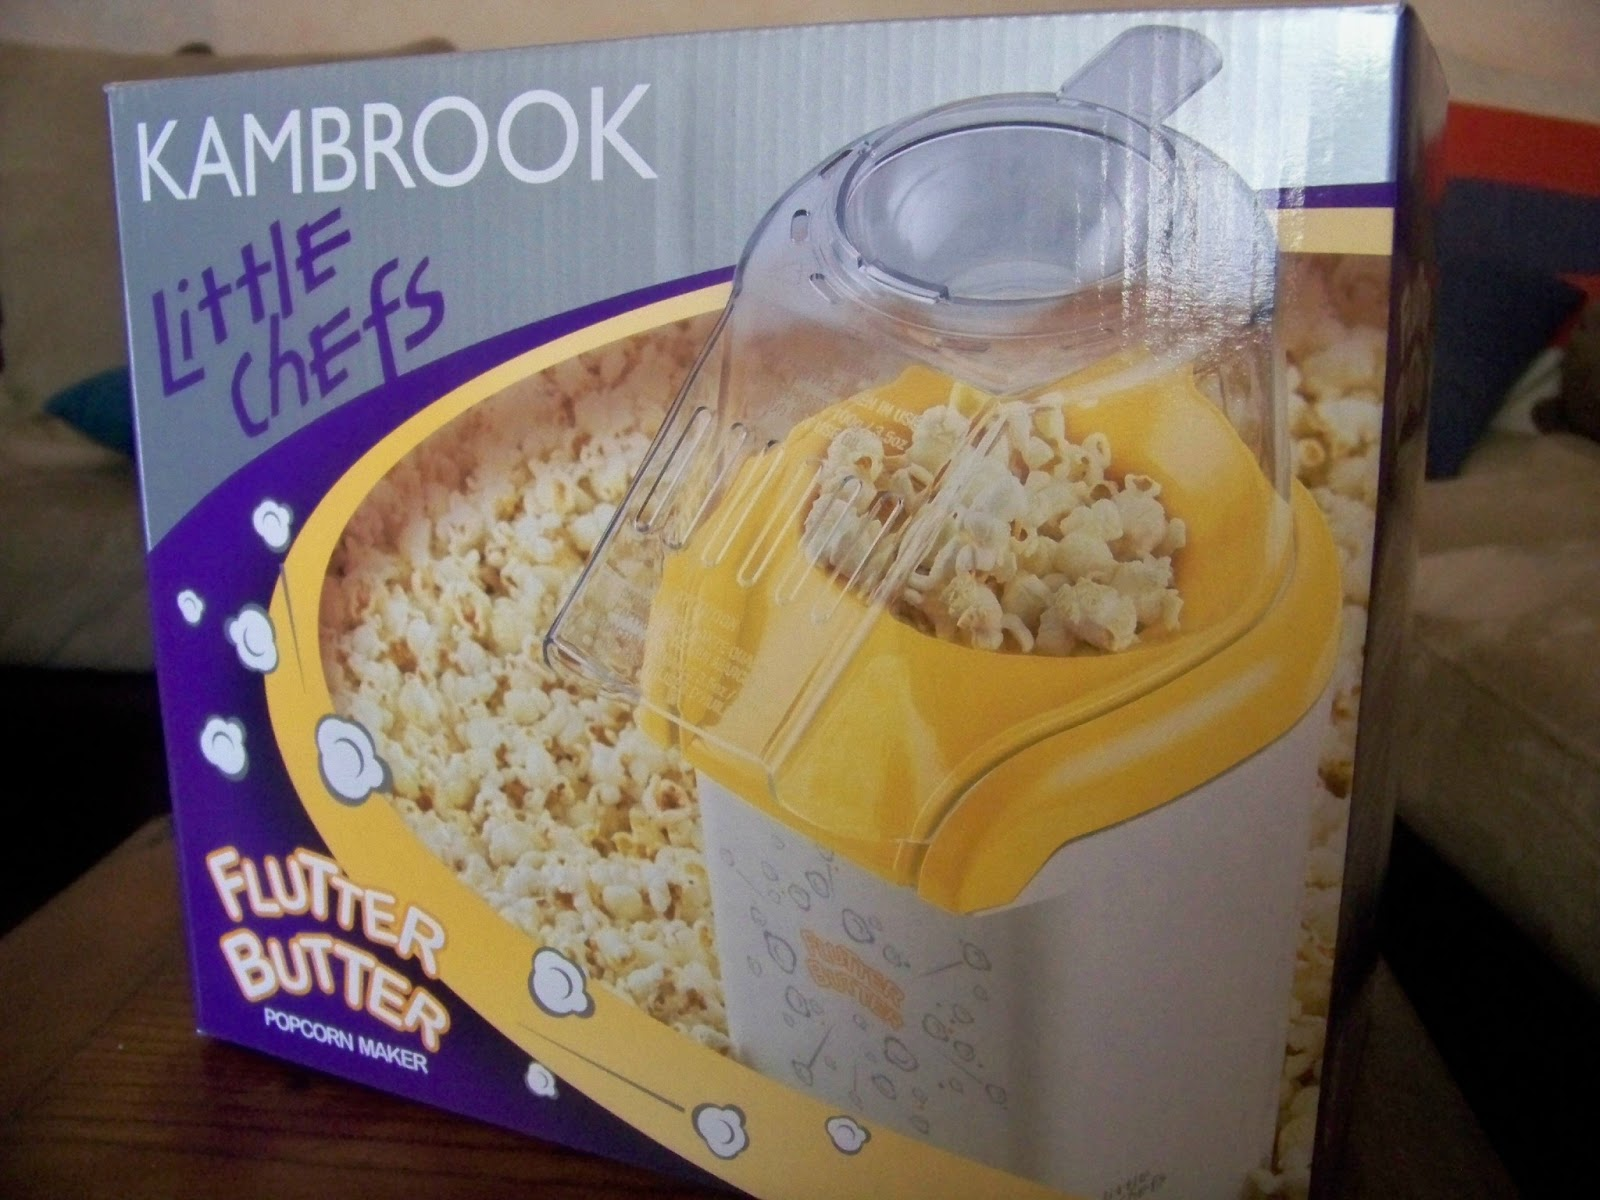 kambrook popcorn maker instructions